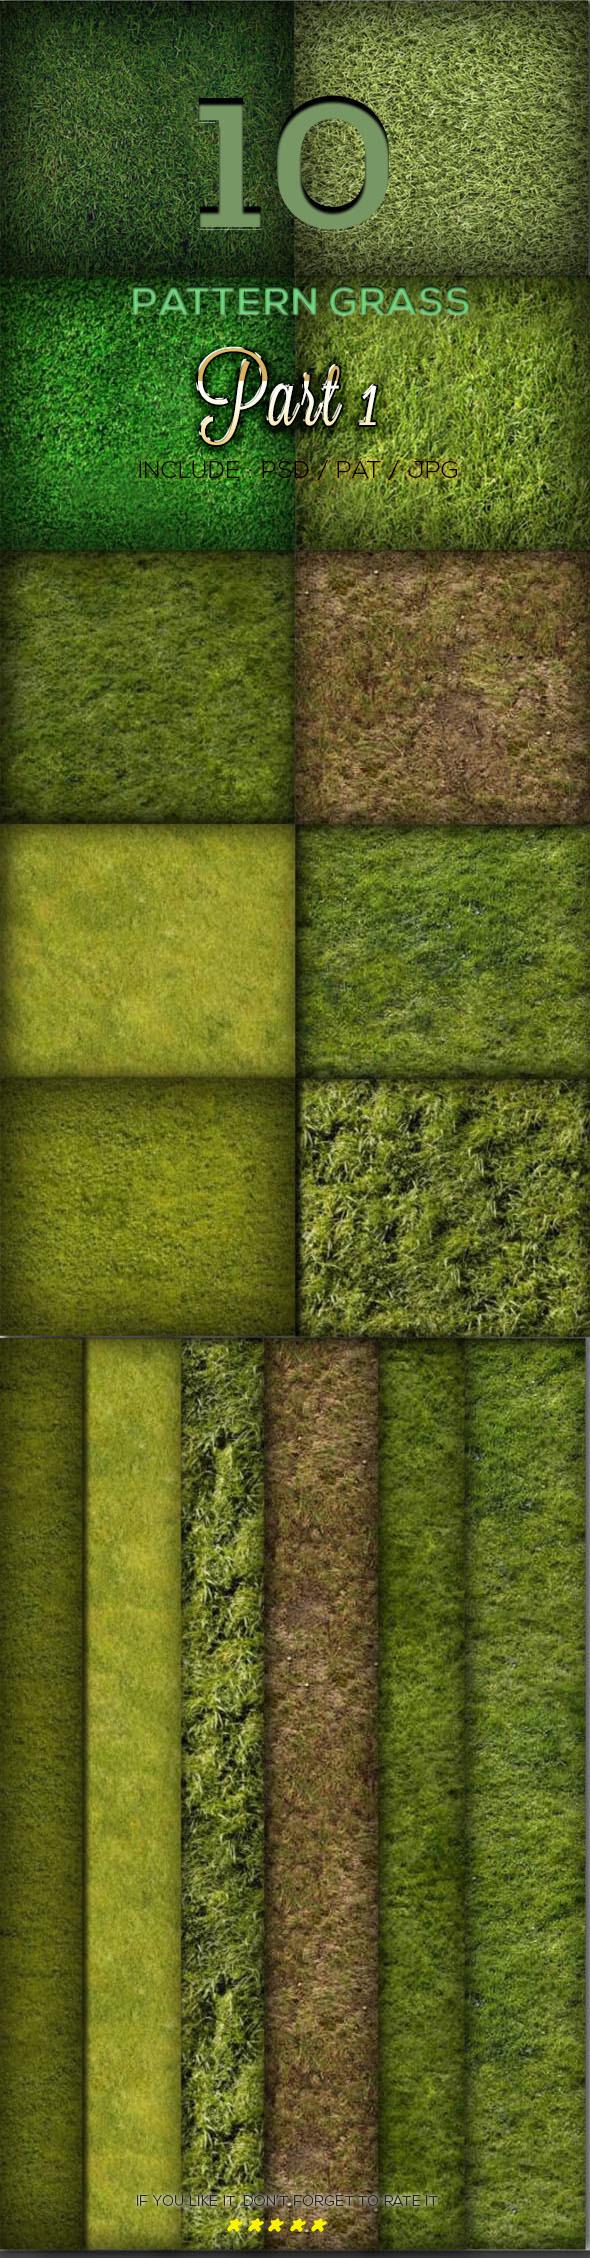 10 Grass Texture Pattern Part 1 - Textures / Fills / Patterns Photoshop